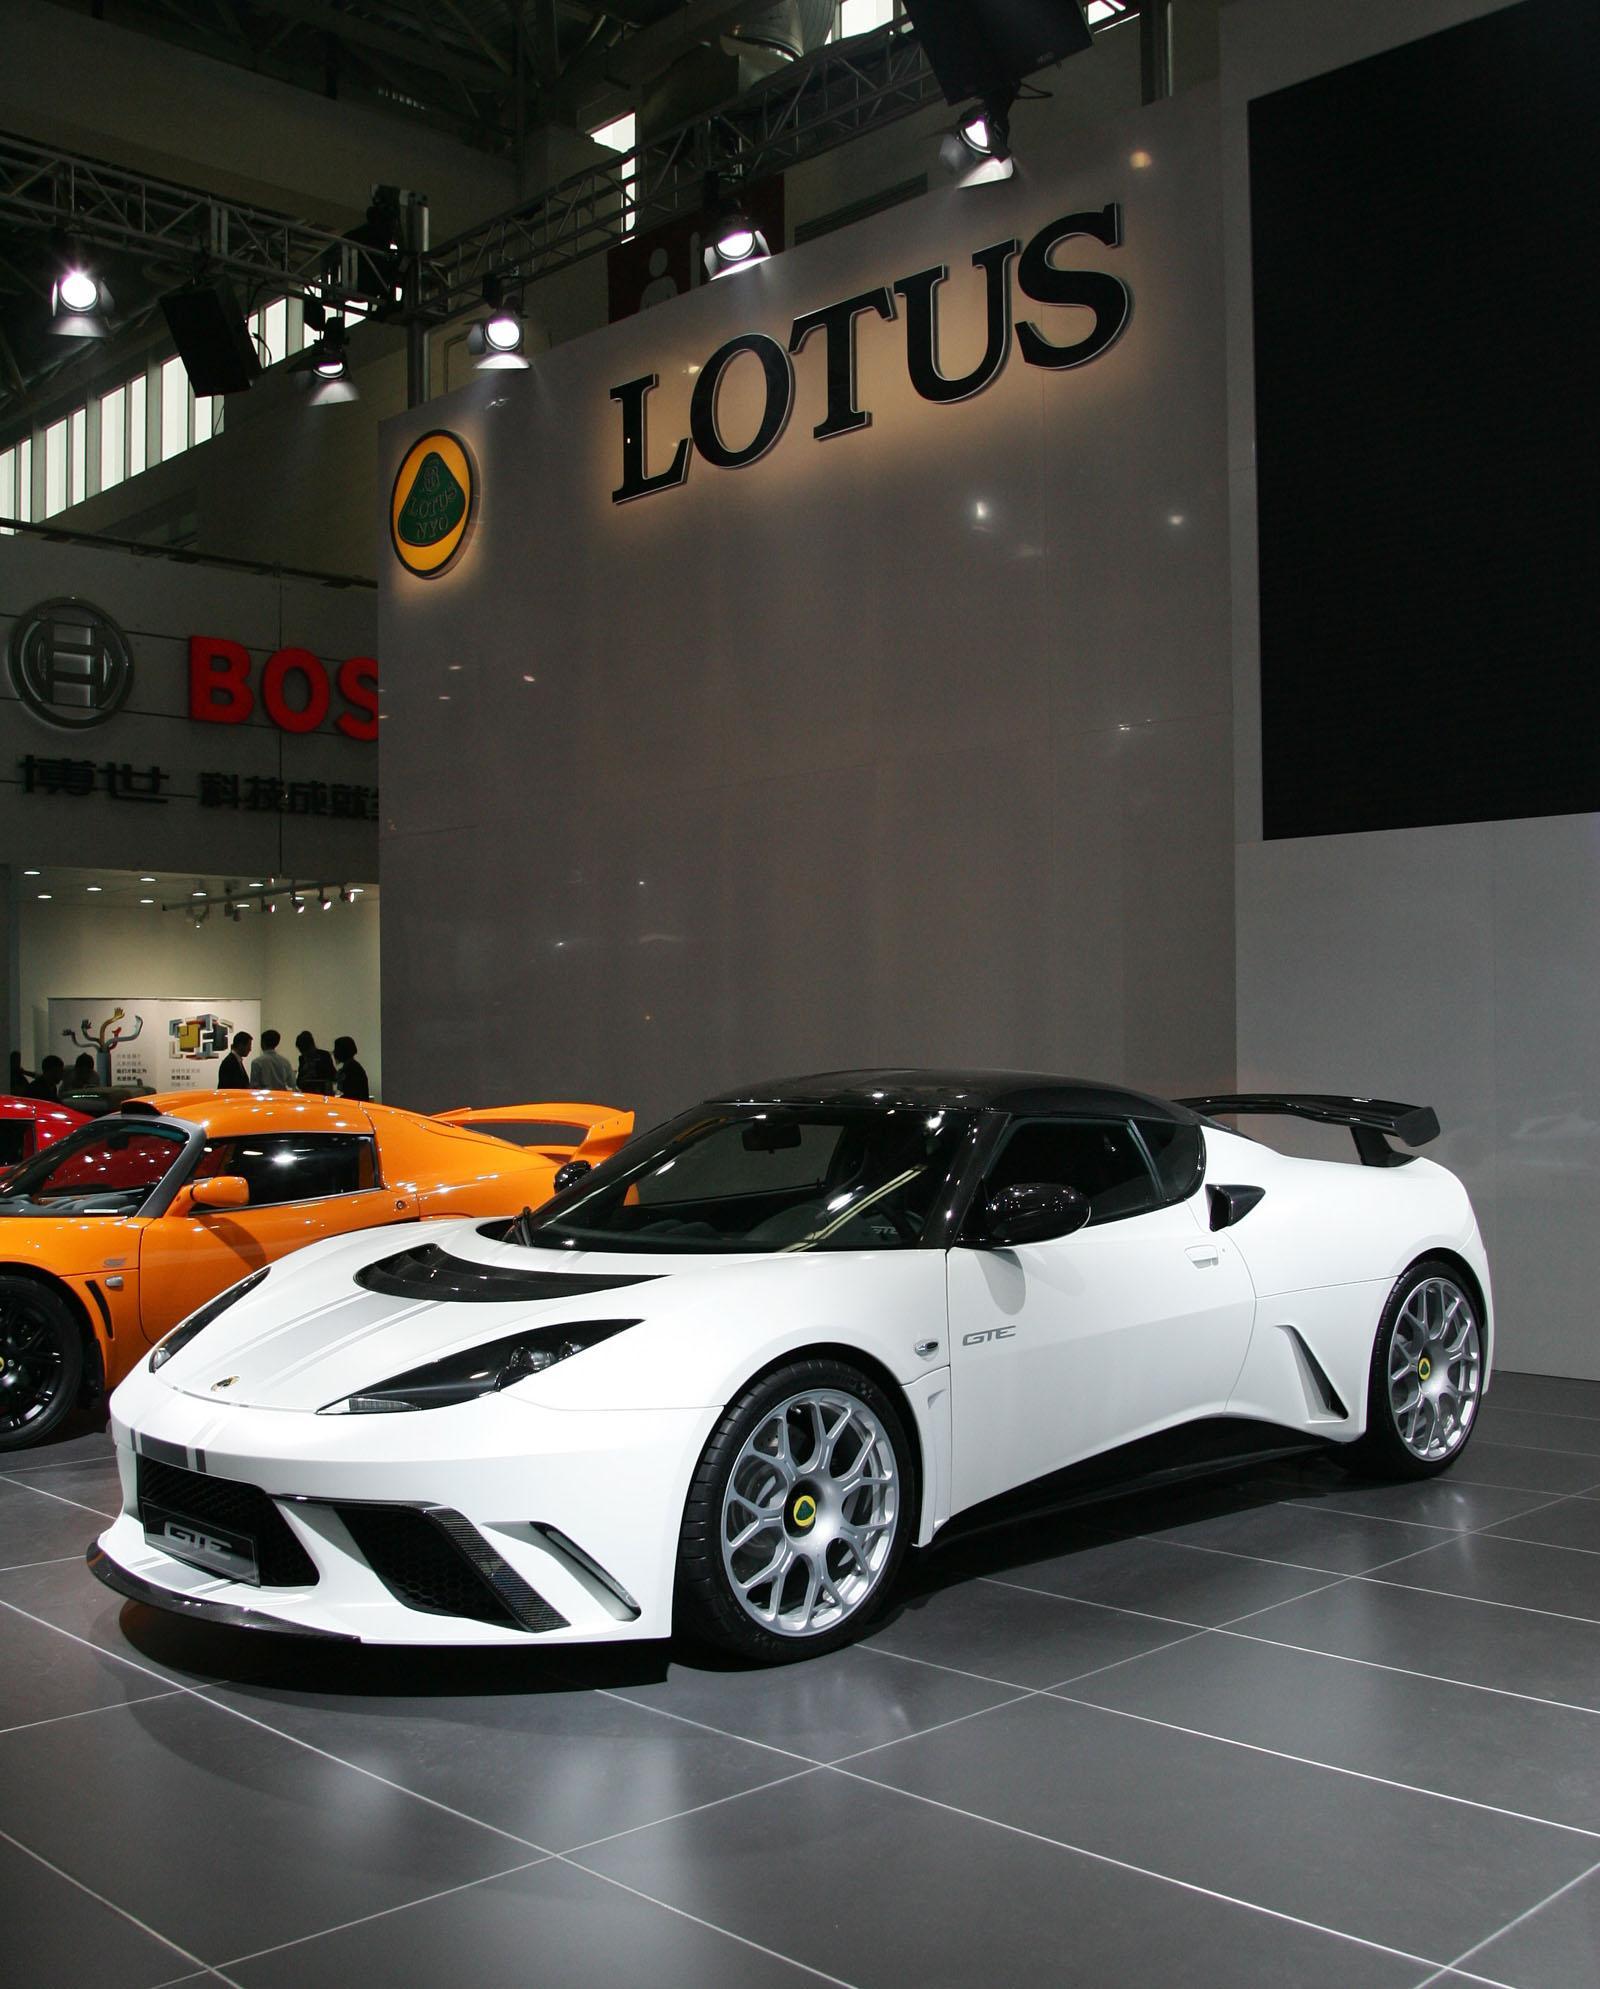 Luxury Sports Car Lotus